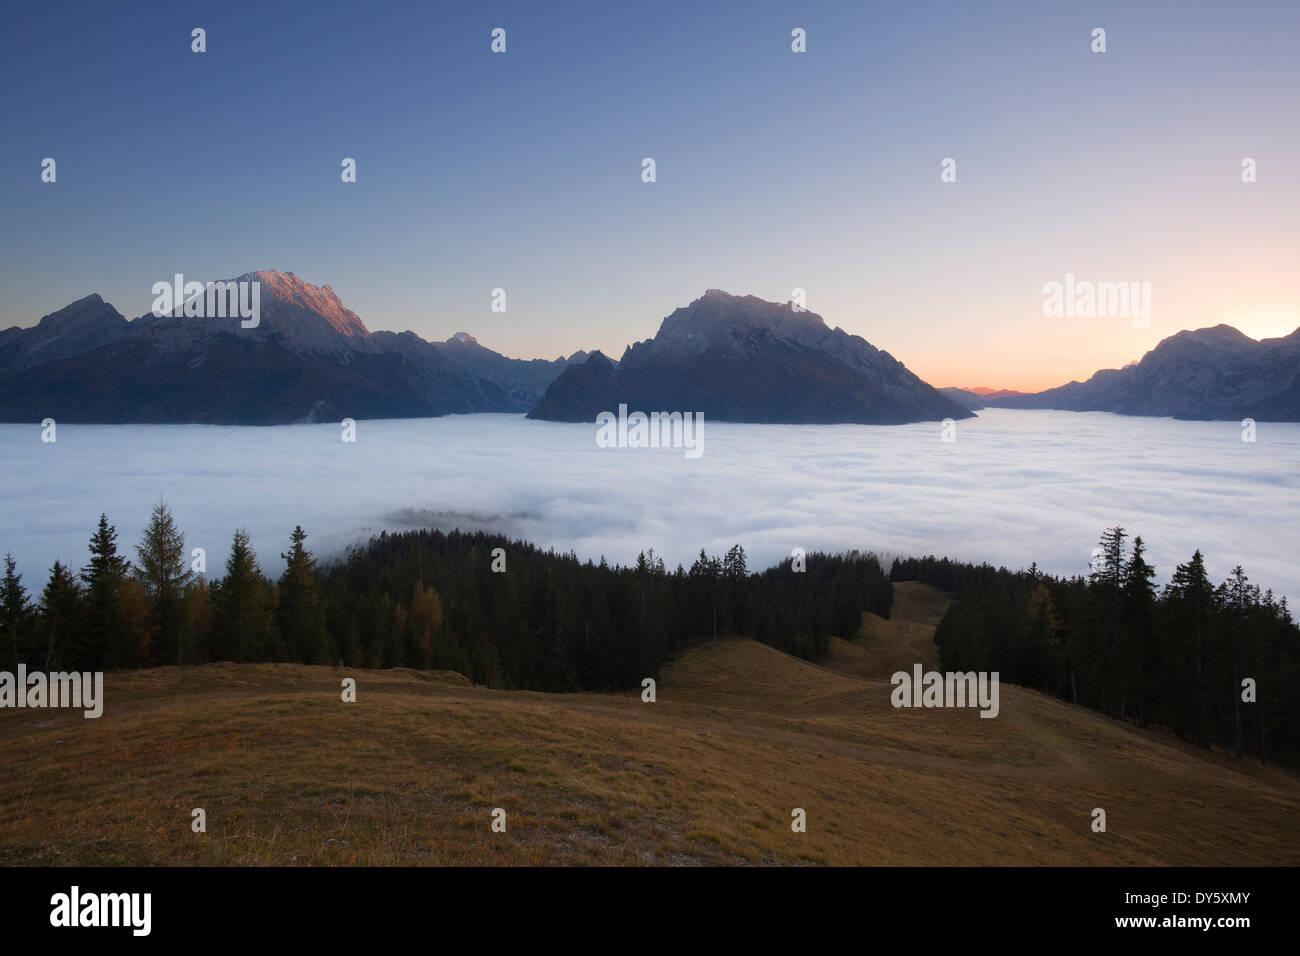 View over the fog in the valley onto Watzmann, Hochkalter and Reiteralpe at dawn, Berchtesgaden region, Berchtesgaden National P - Stock Image